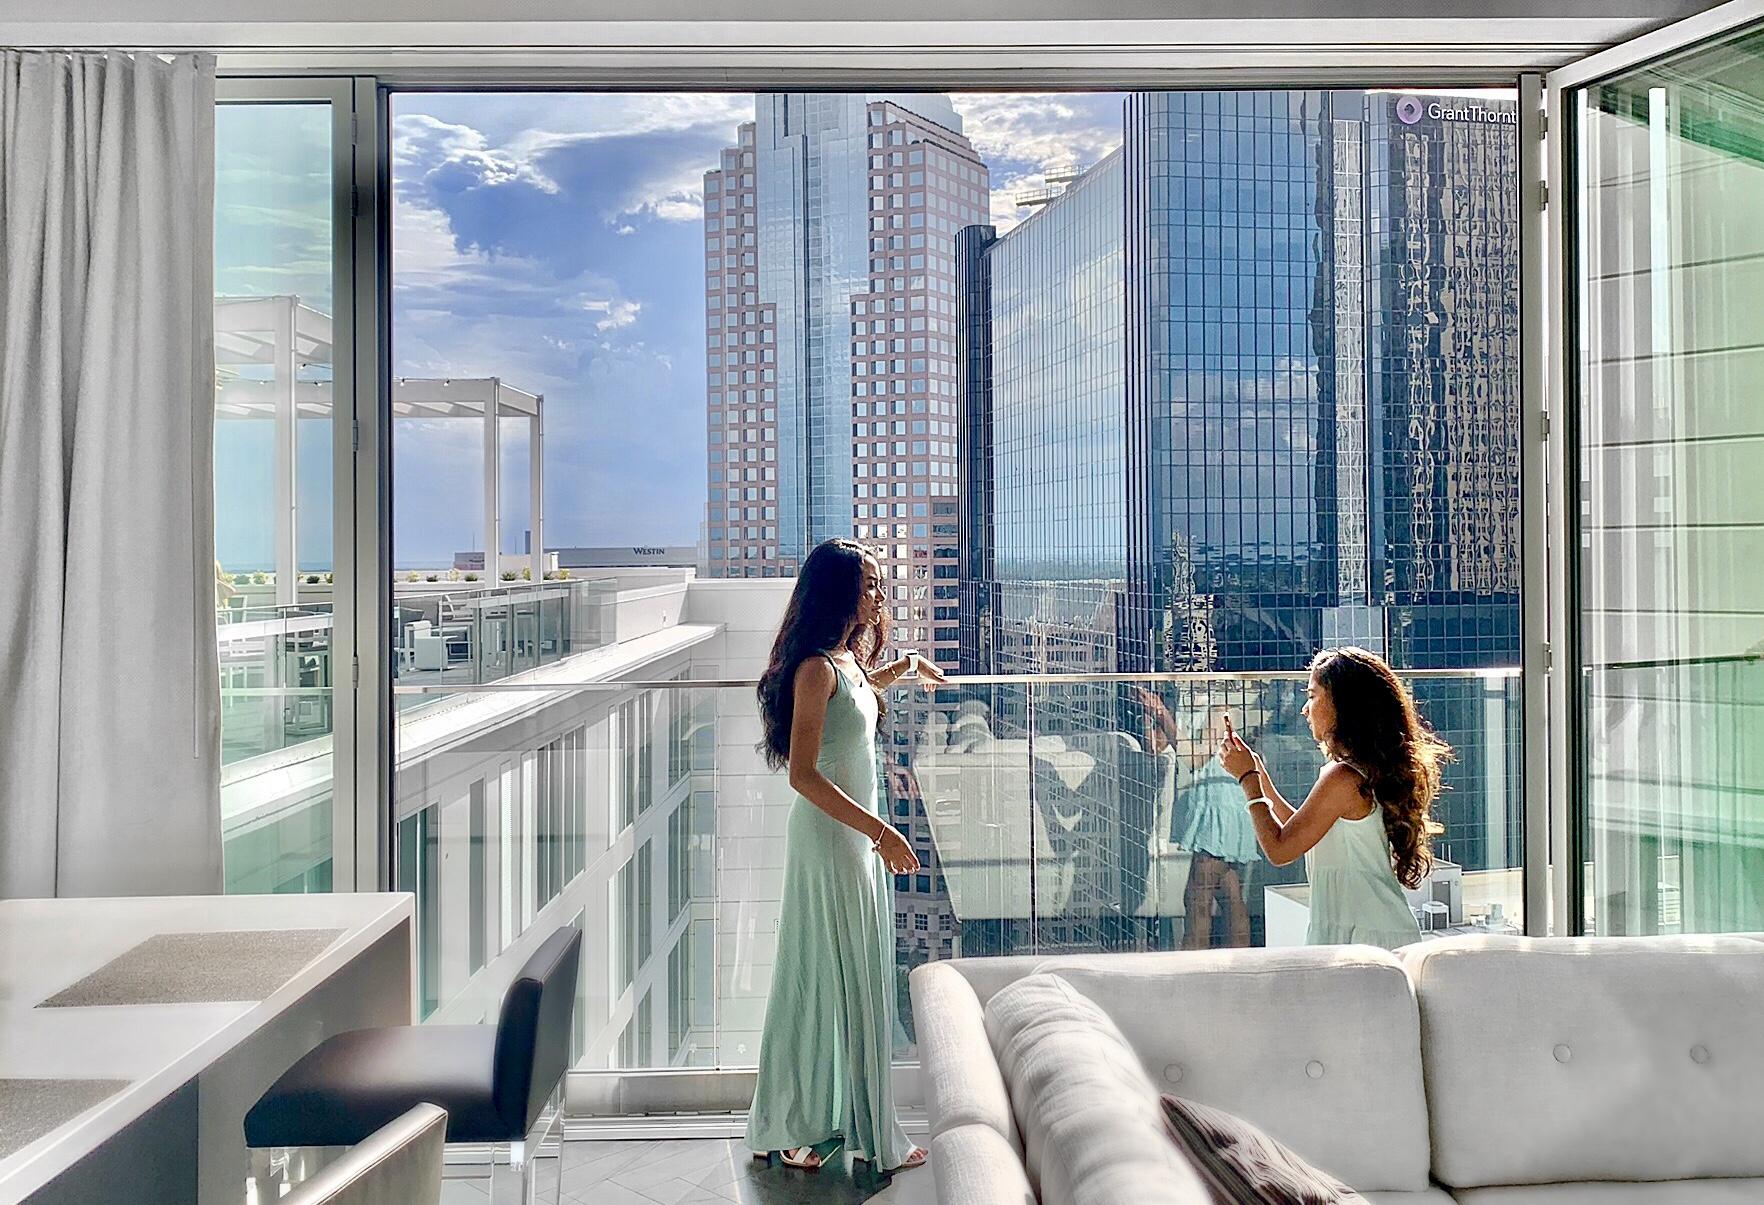 AC Hotel Charlotte, AC Hotel Marriott, Nuvolé Rooftop Twenty Two, Charlotte blogger, AC Hotel views, Nuvolé Twenty Two Penthouse Suite,